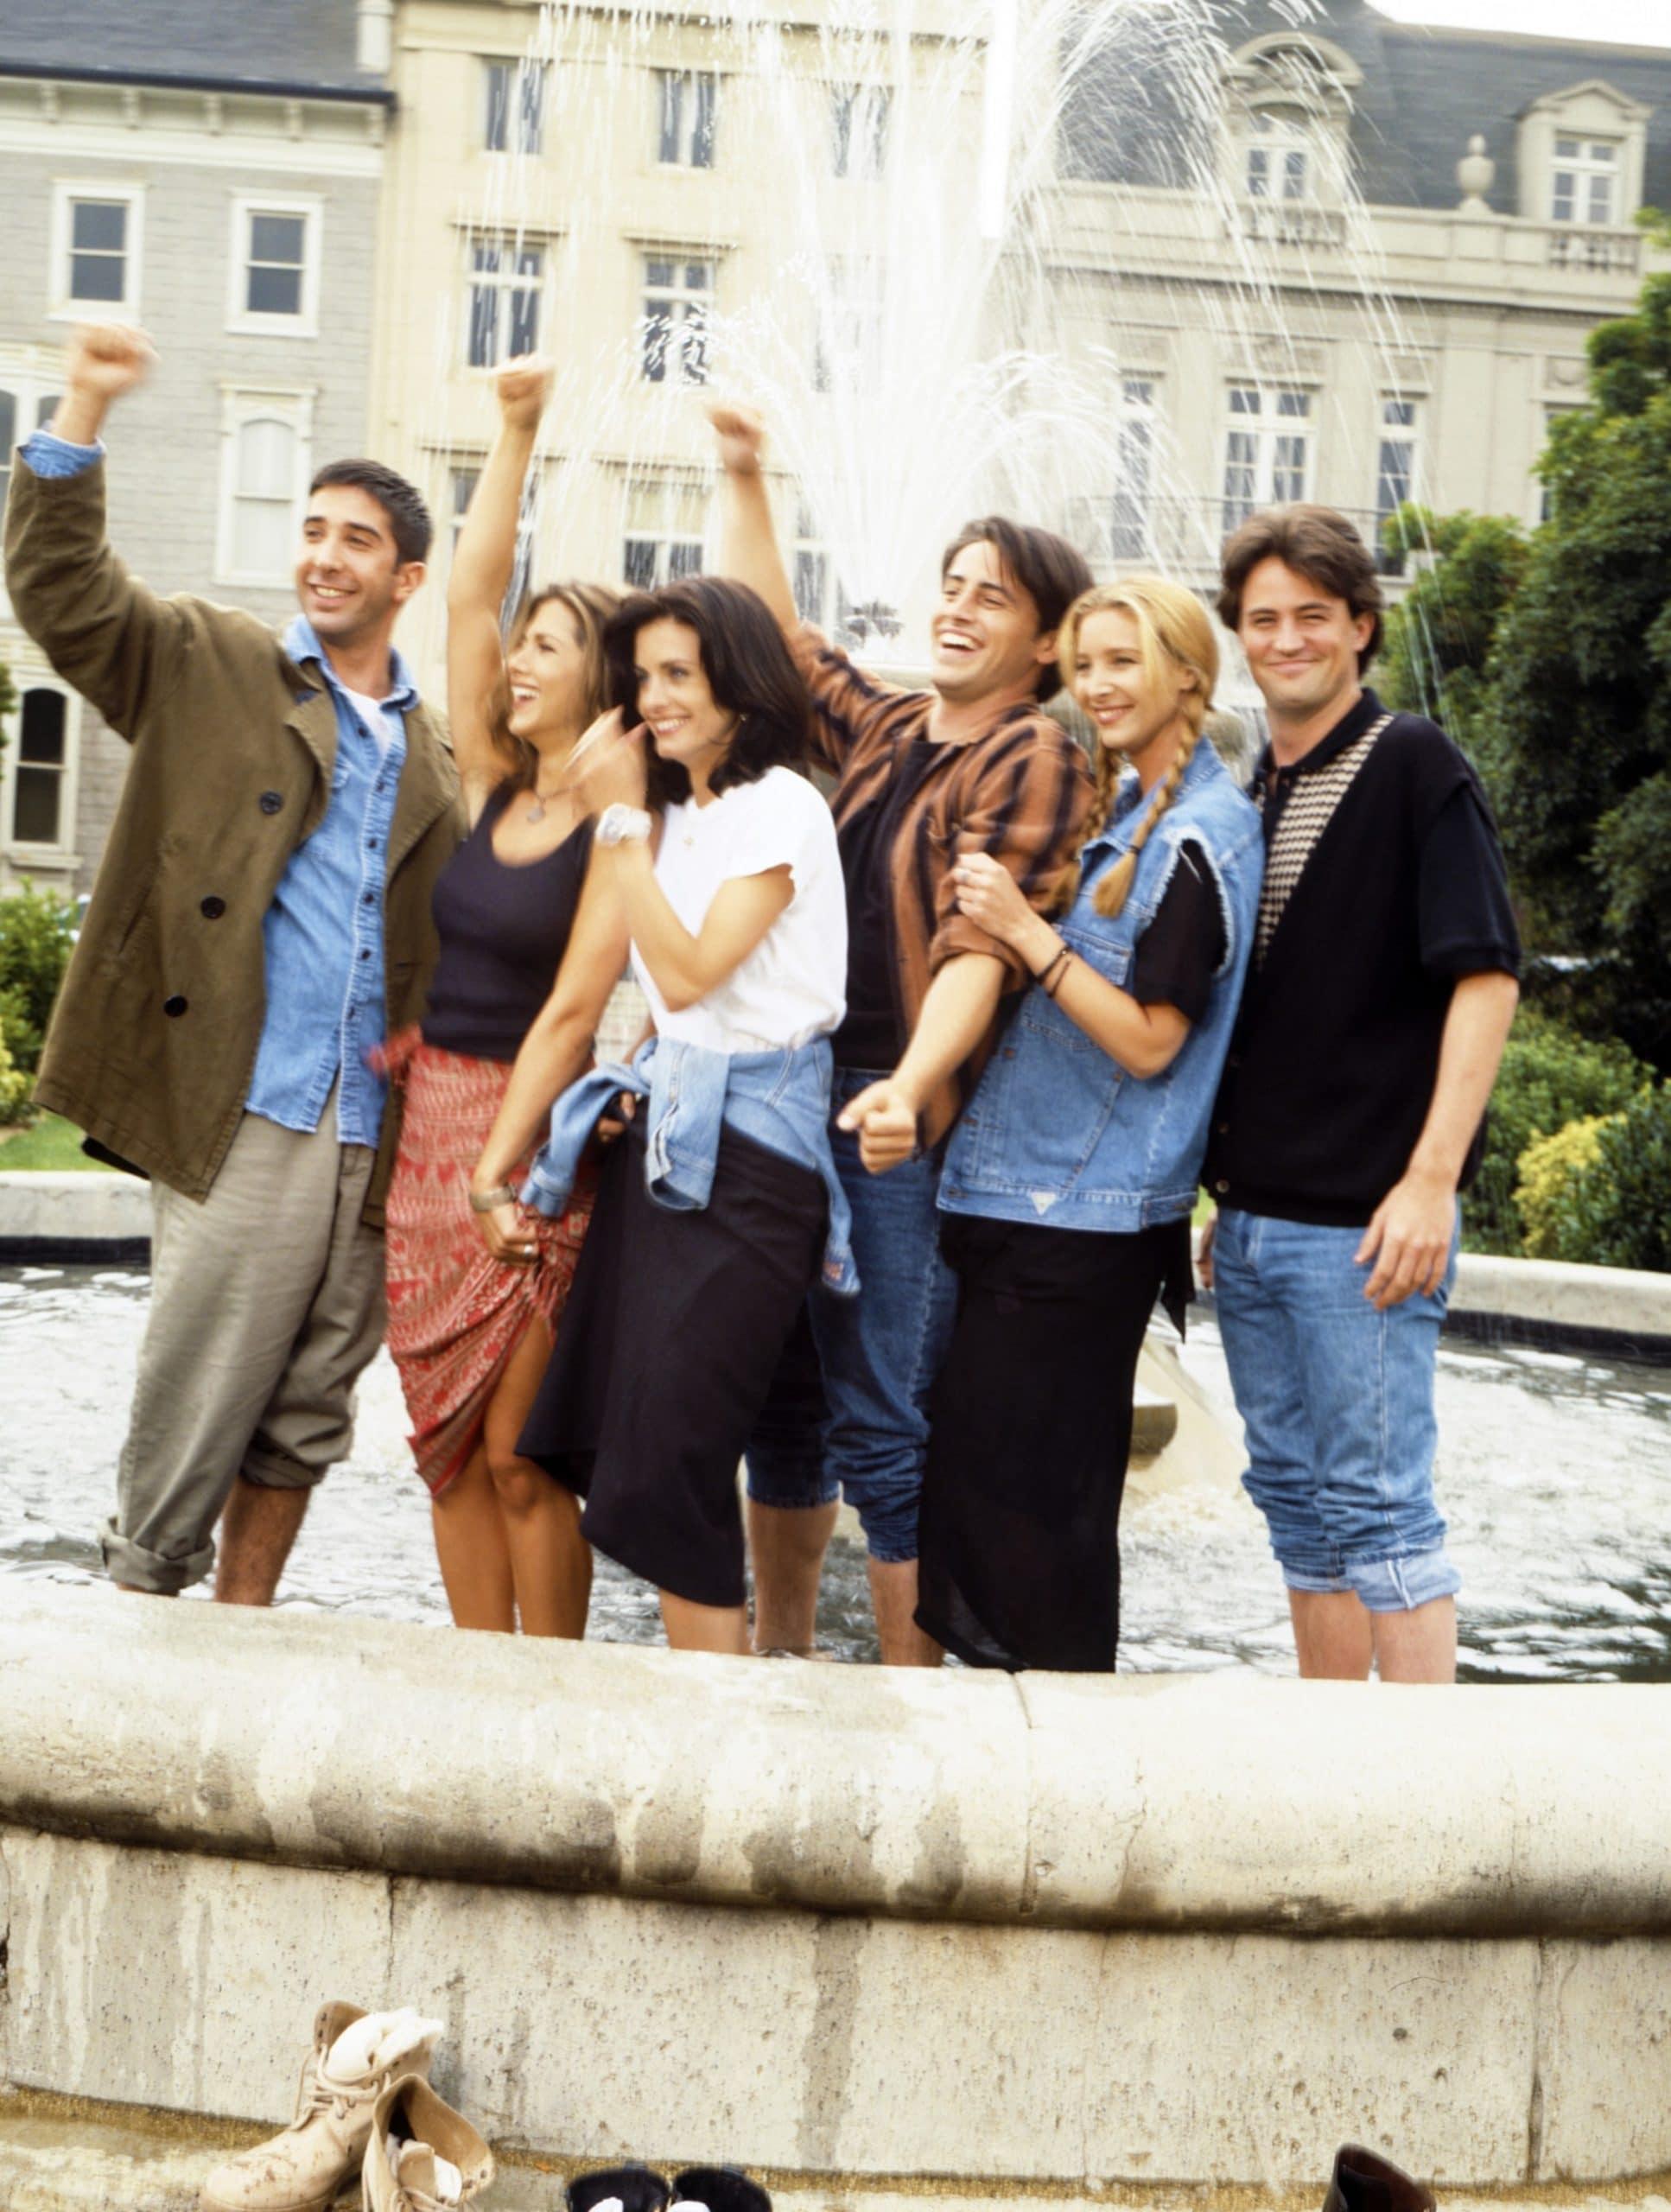 FRIENDS, from left: David Schwimmer, Jennifer Aniston, Courteney Cox, Matt LeBlanc, Lisa Kudrow, Matthew Perry, 1994-2004